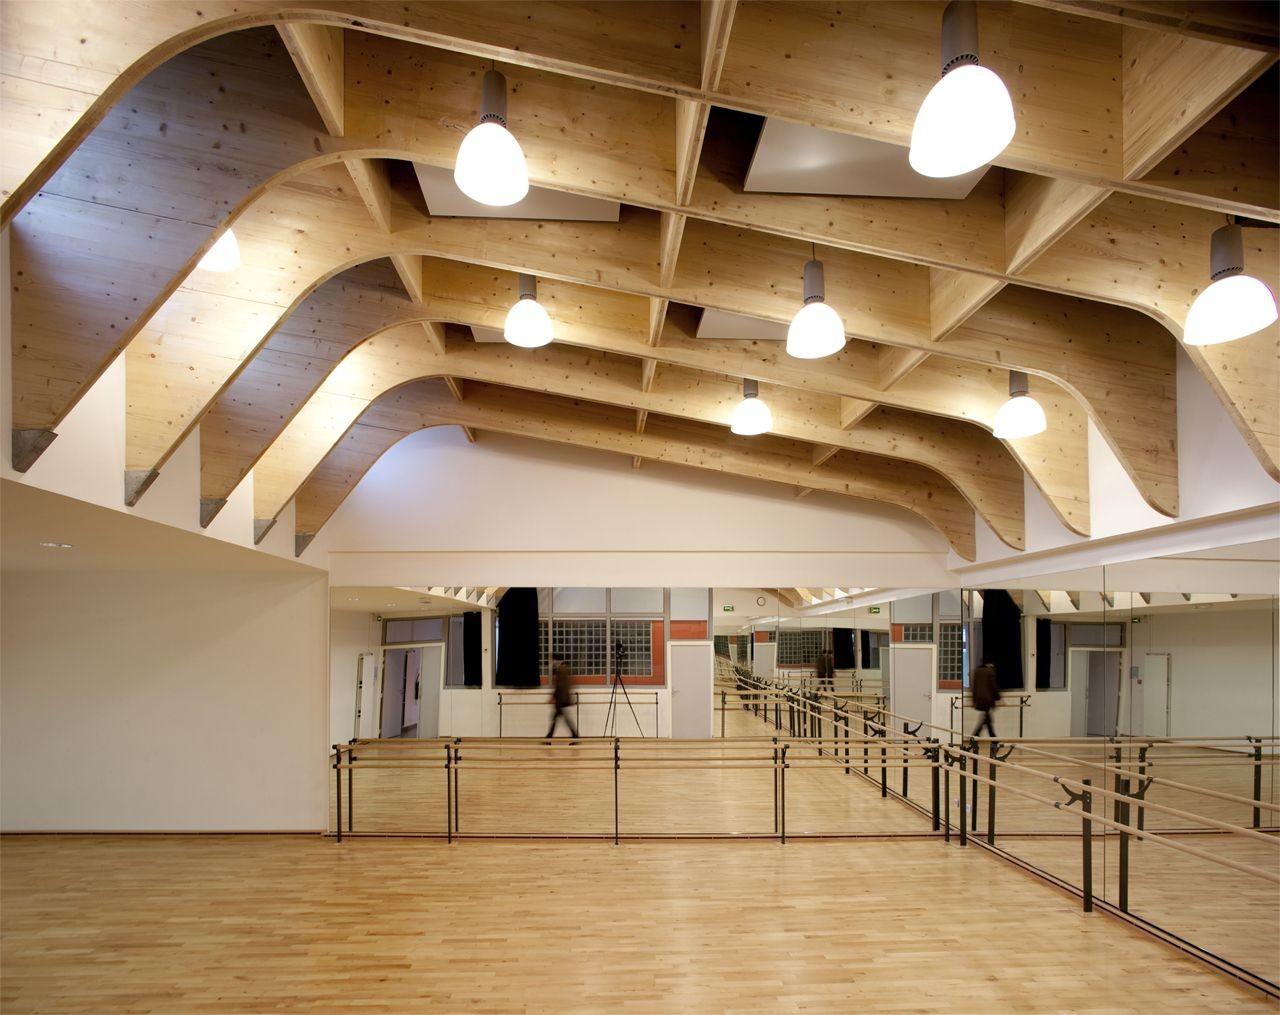 gallery of gymnasium r gis racine atelier d 39 architecture alexandre dreyss 11. Black Bedroom Furniture Sets. Home Design Ideas